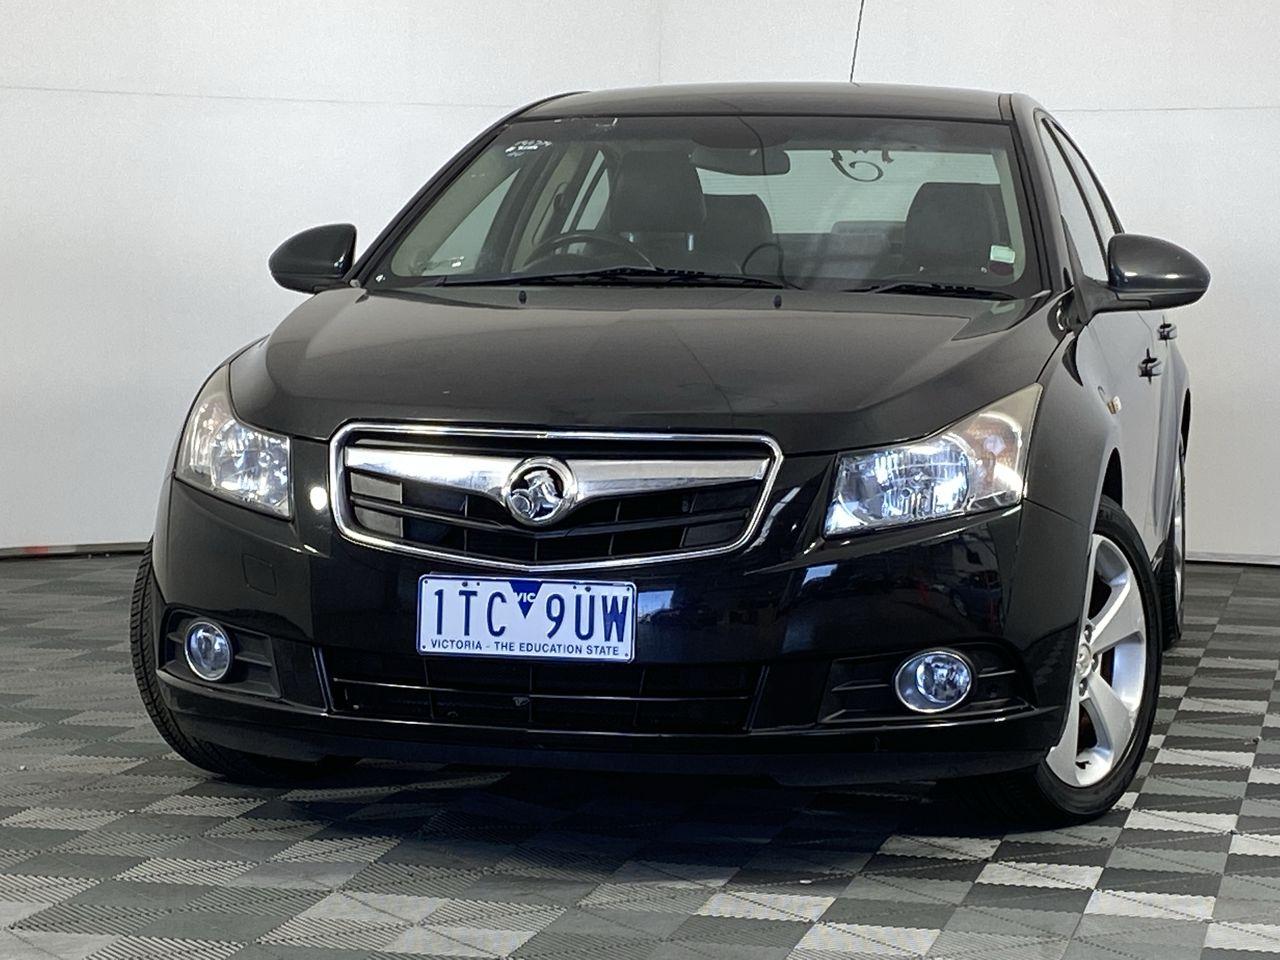 2010 Holden Cruze CDX JG Automatic Sedan